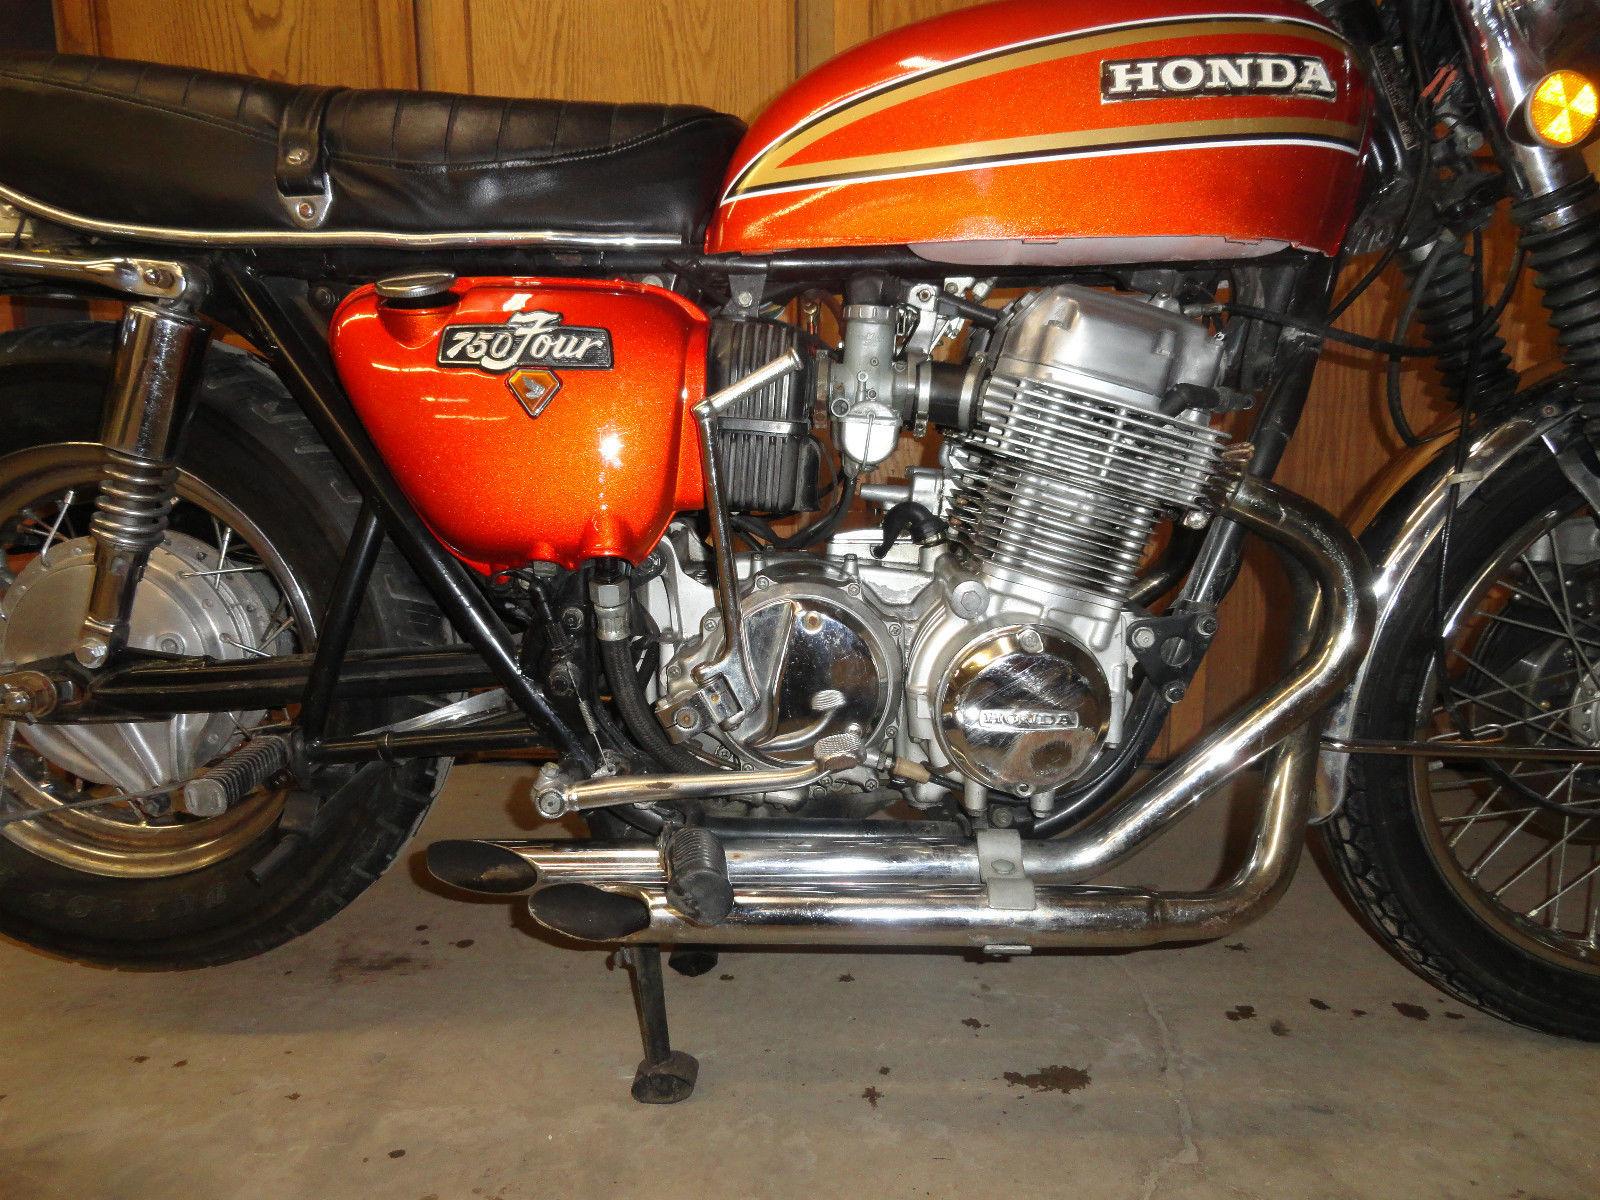 1975 honda cb750 sunburst orange low miles 1975 honda cb publicscrutiny Choice Image